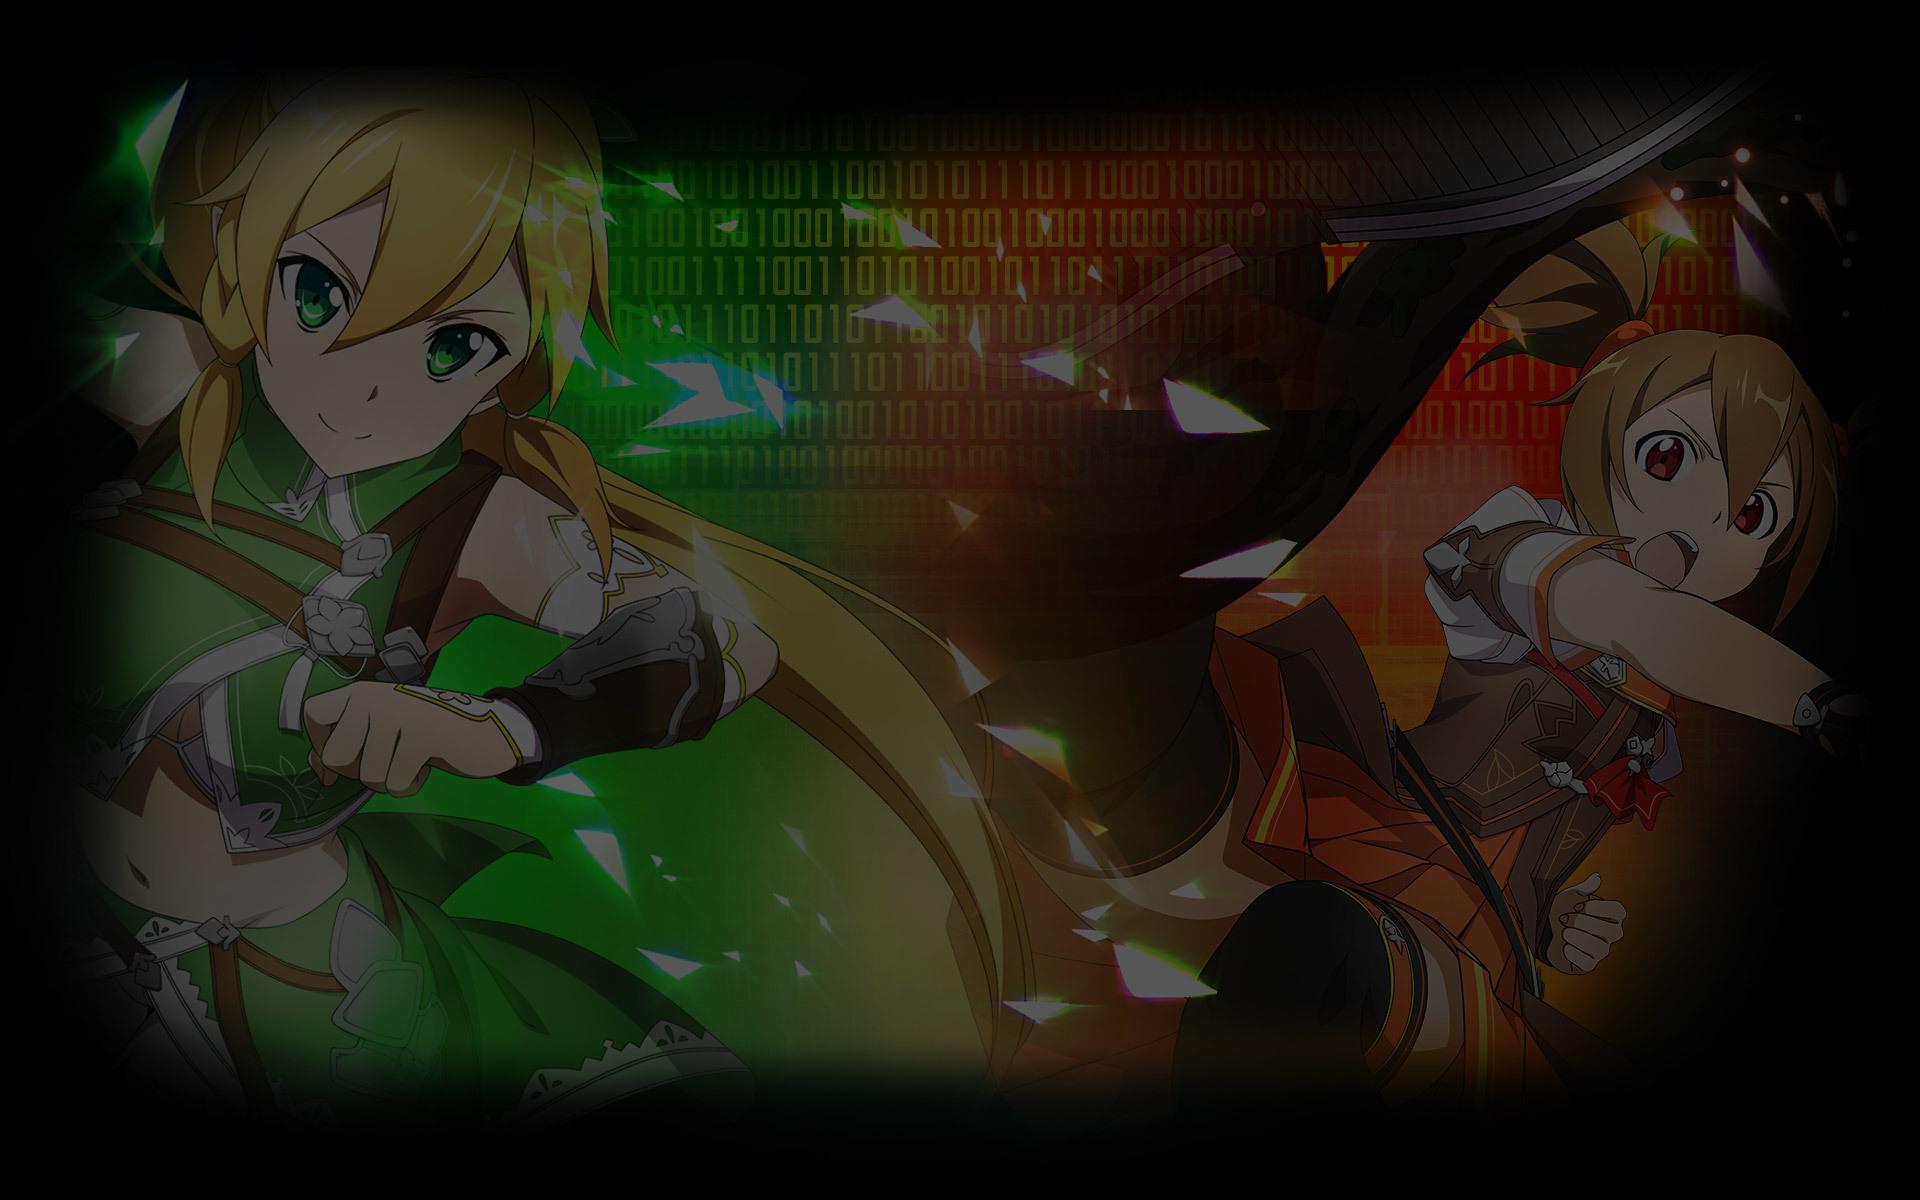 Download 82 Koleksi Background Art Steam HD Terbaru